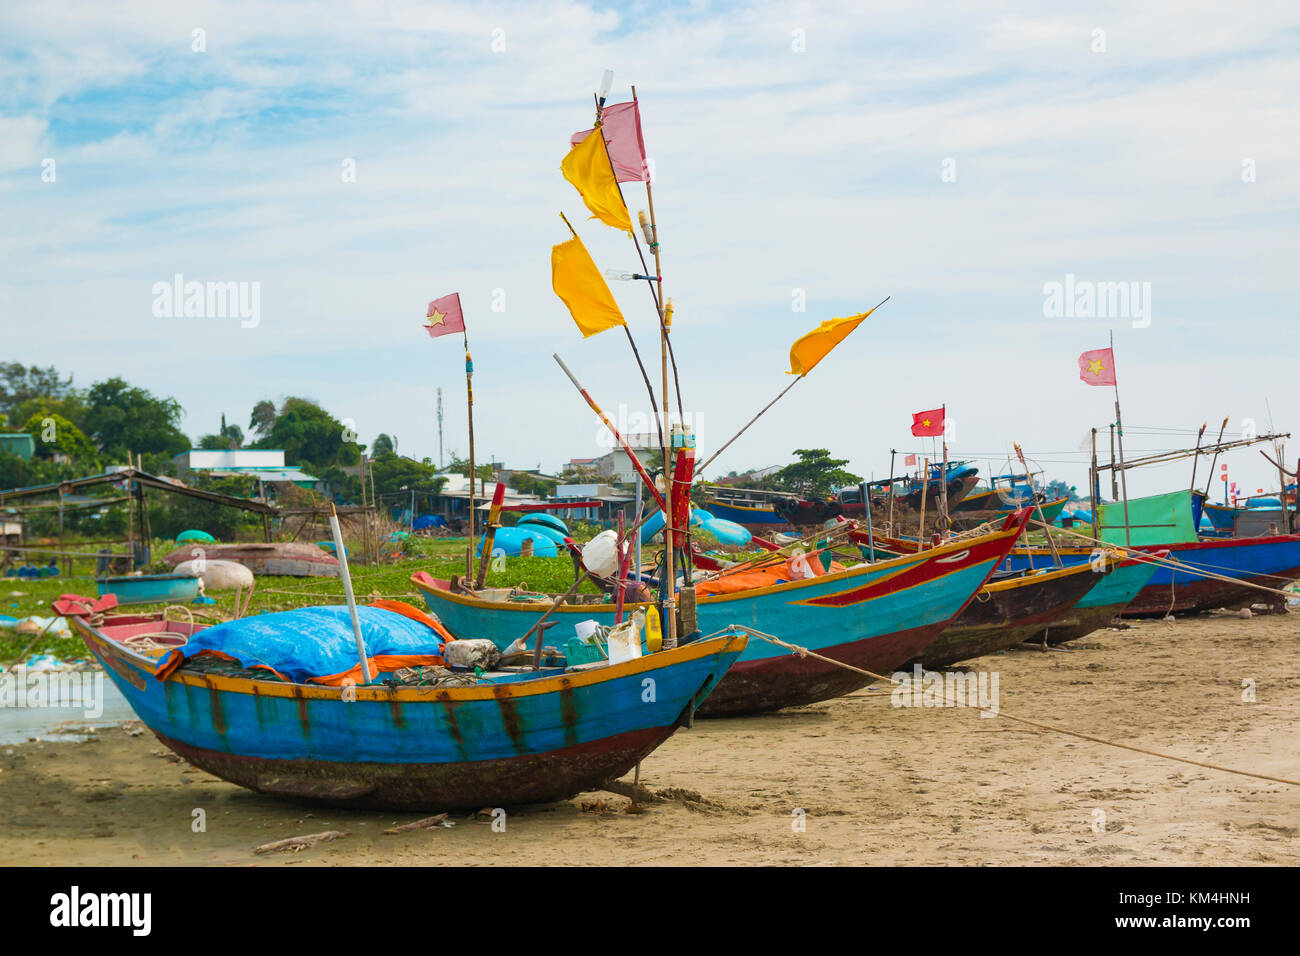 Traditional Vietnamese fishing coracles on beach, boats in fishing village, Mui Ne, Vietnam - Stock Image